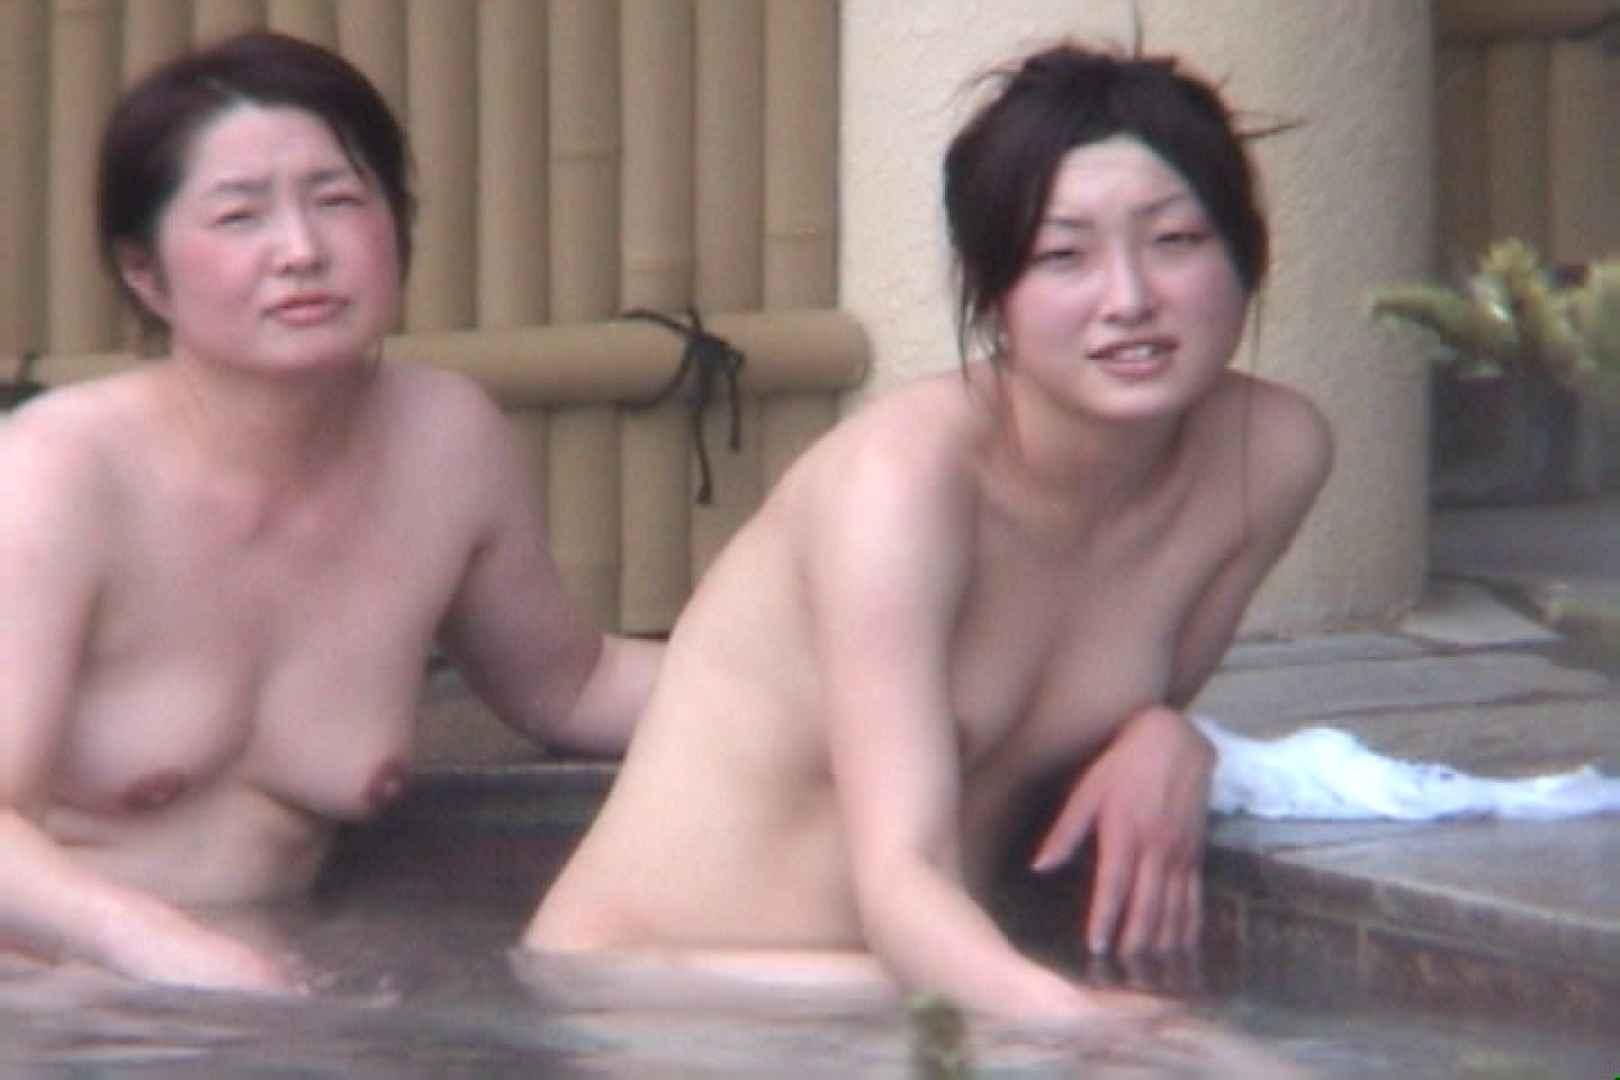 Aquaな露天風呂Vol.44【VIP限定】 露天 おまんこ無修正動画無料 72連発 9